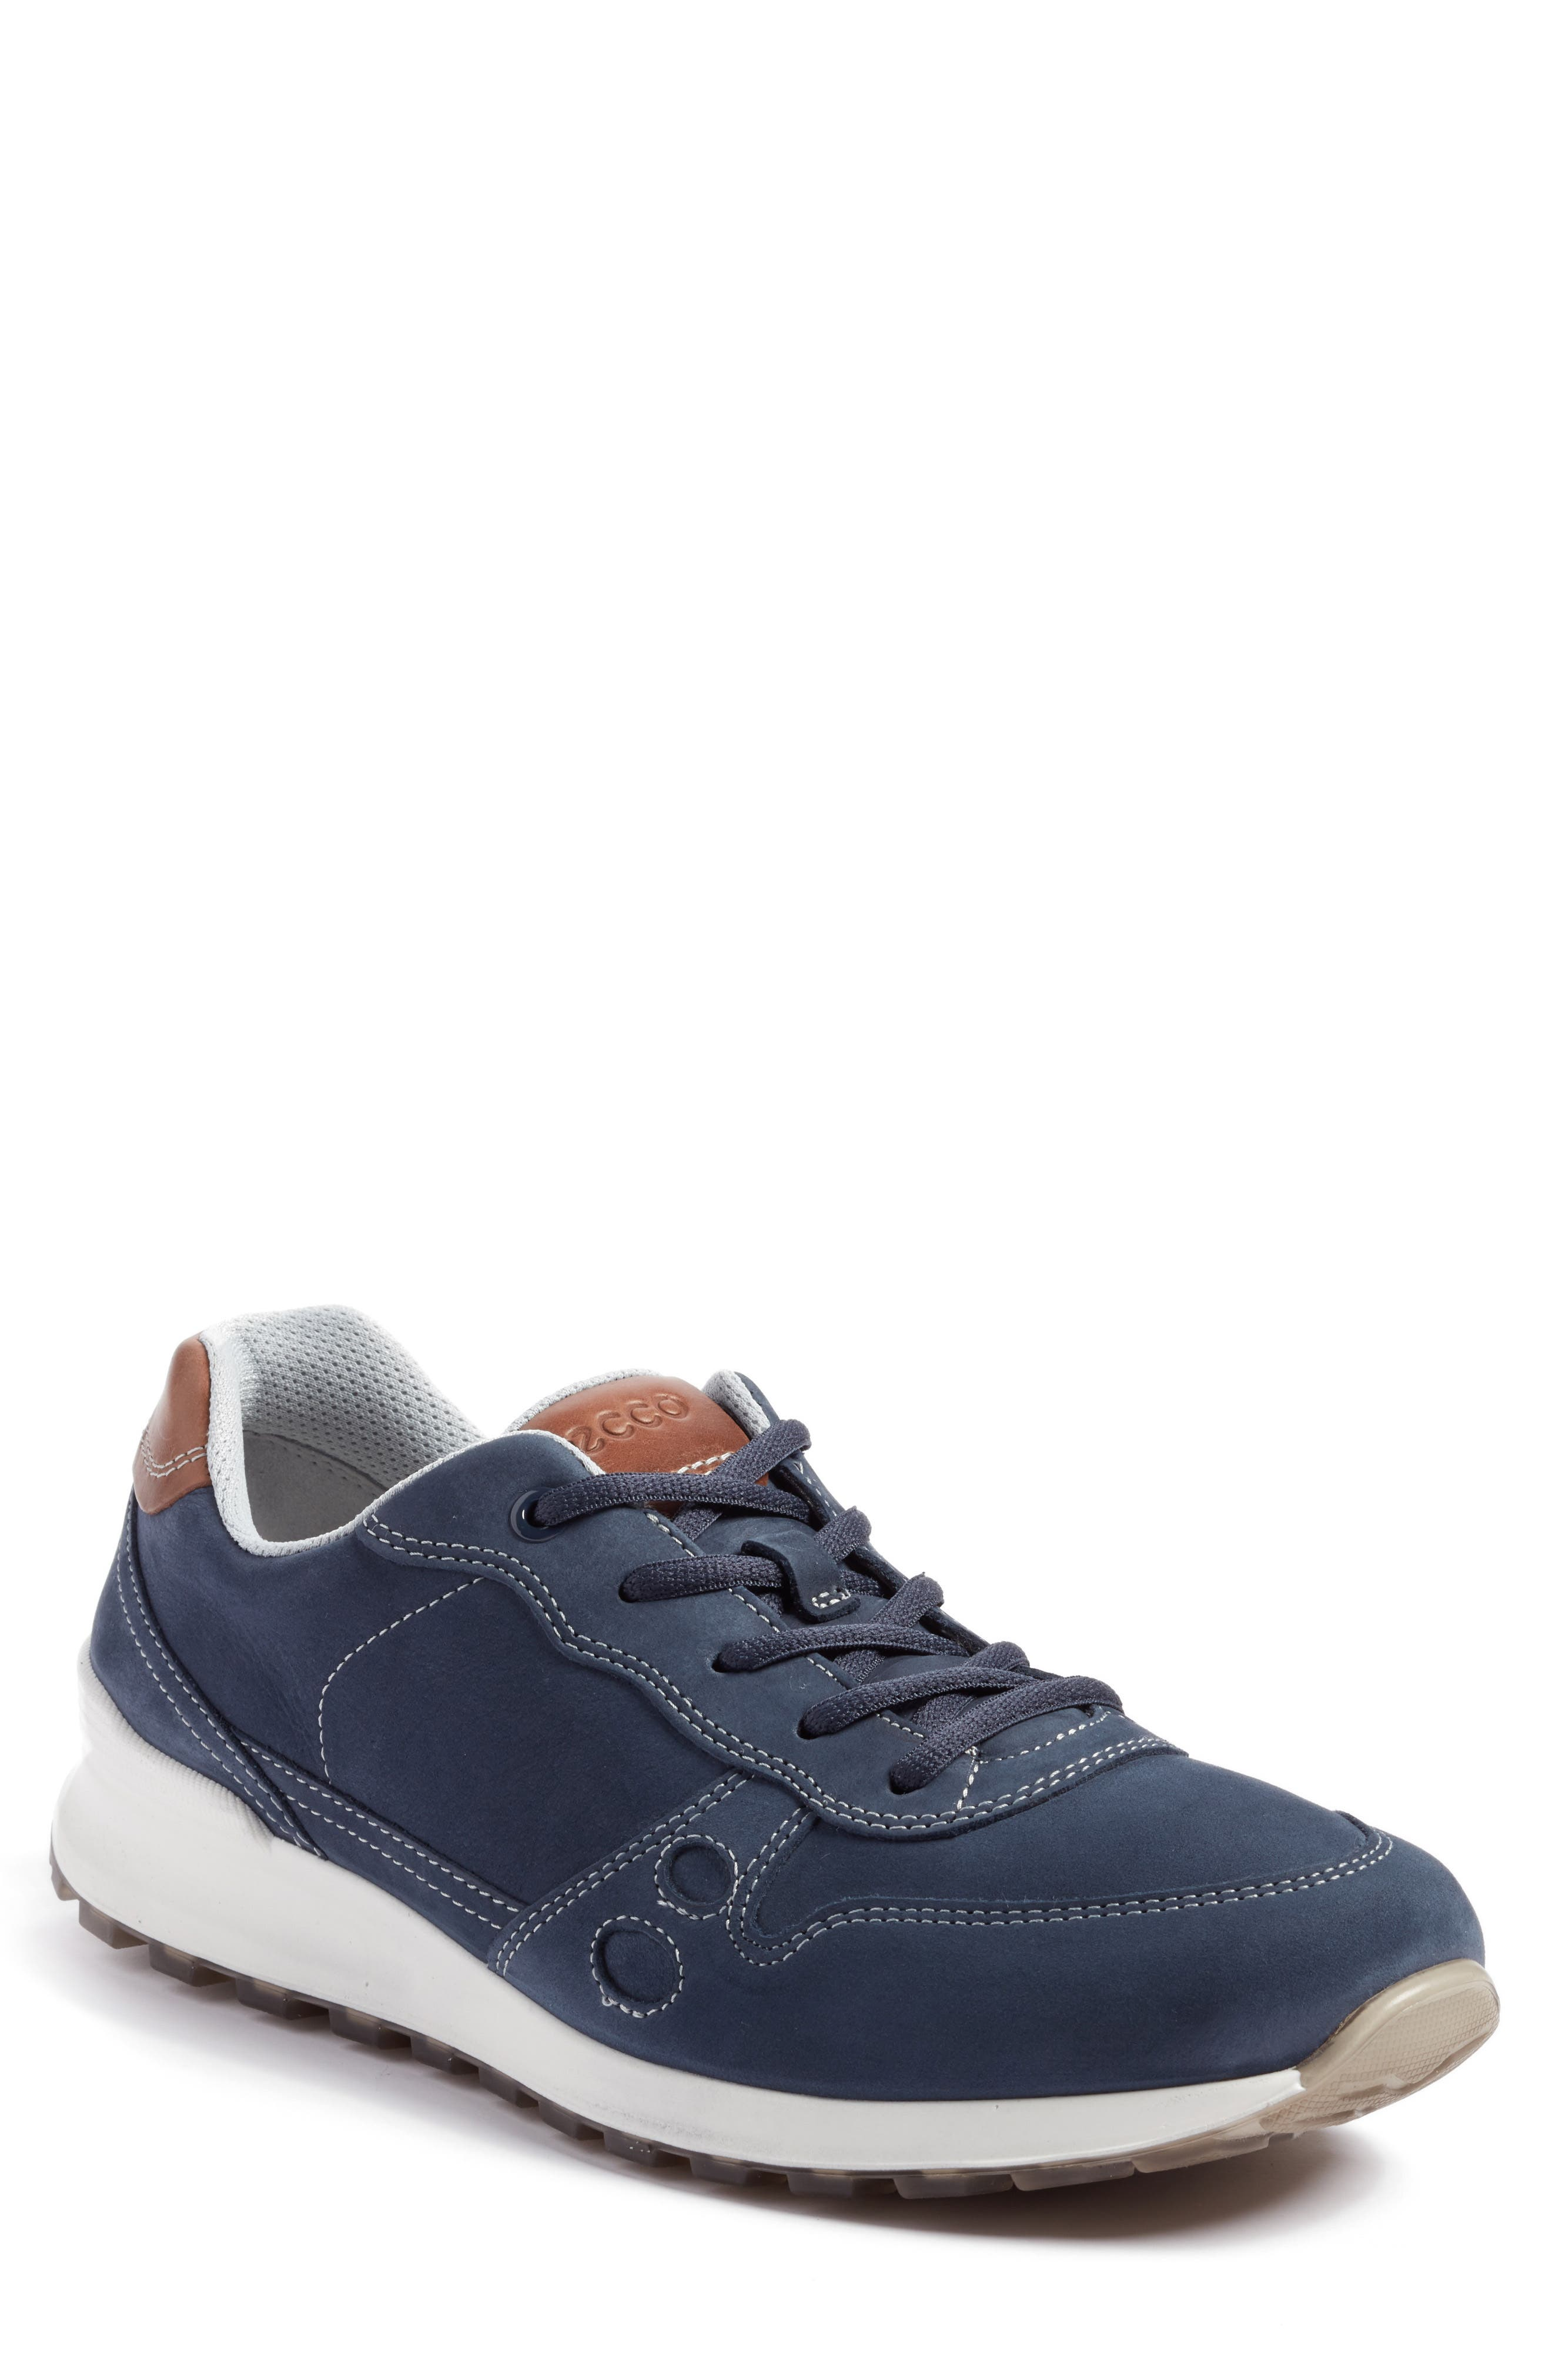 CS14 Retro Sneaker,                             Main thumbnail 1, color,